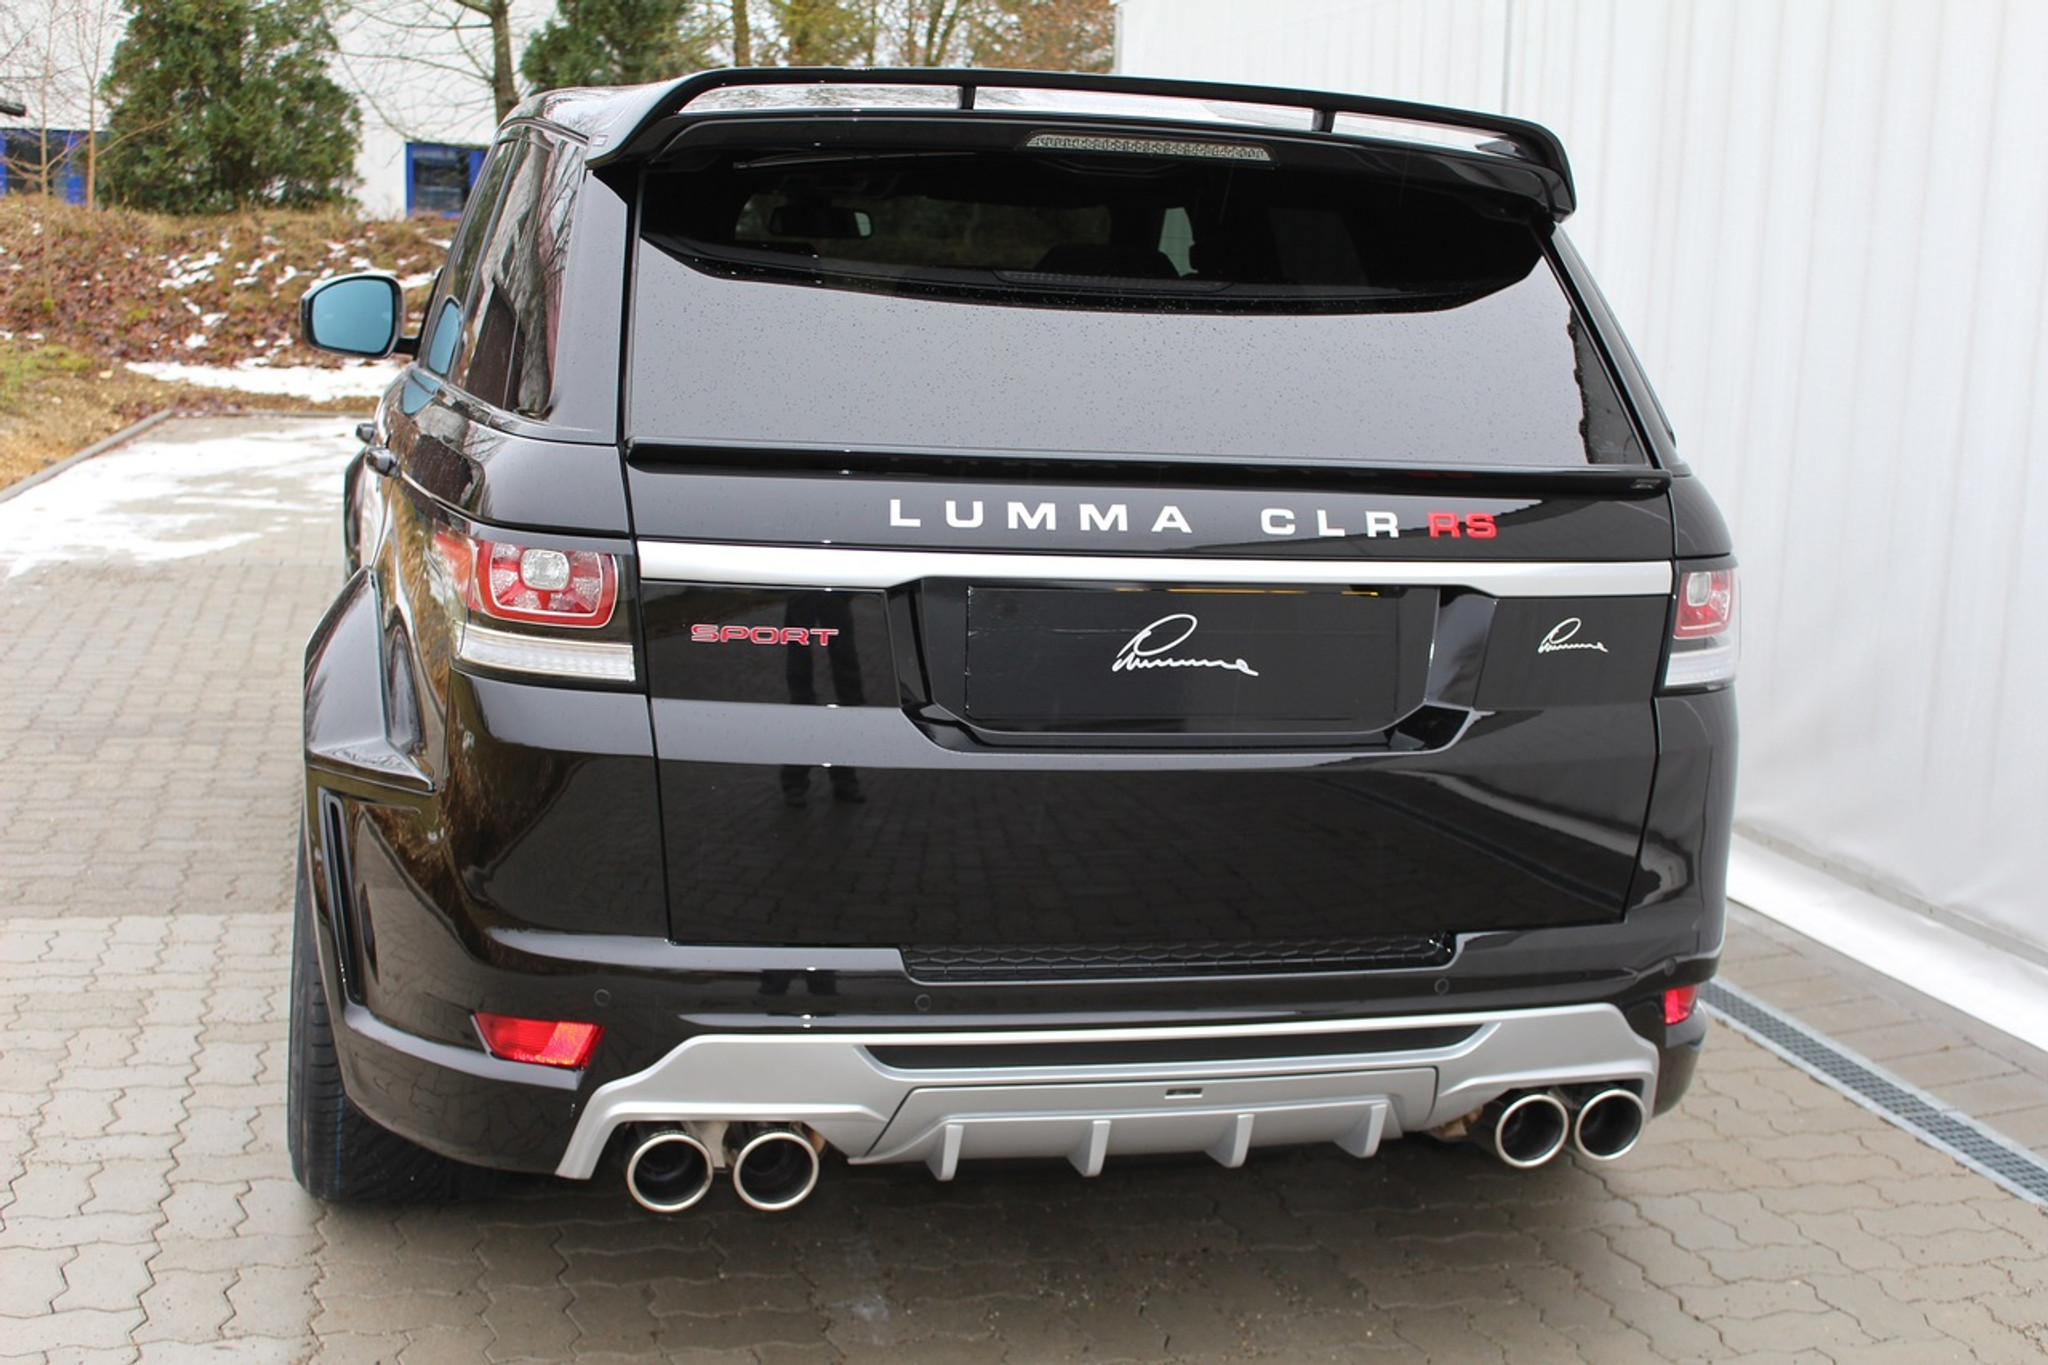 Range rover sport 2014 lumma design clr rs package for Range rover exterior design package